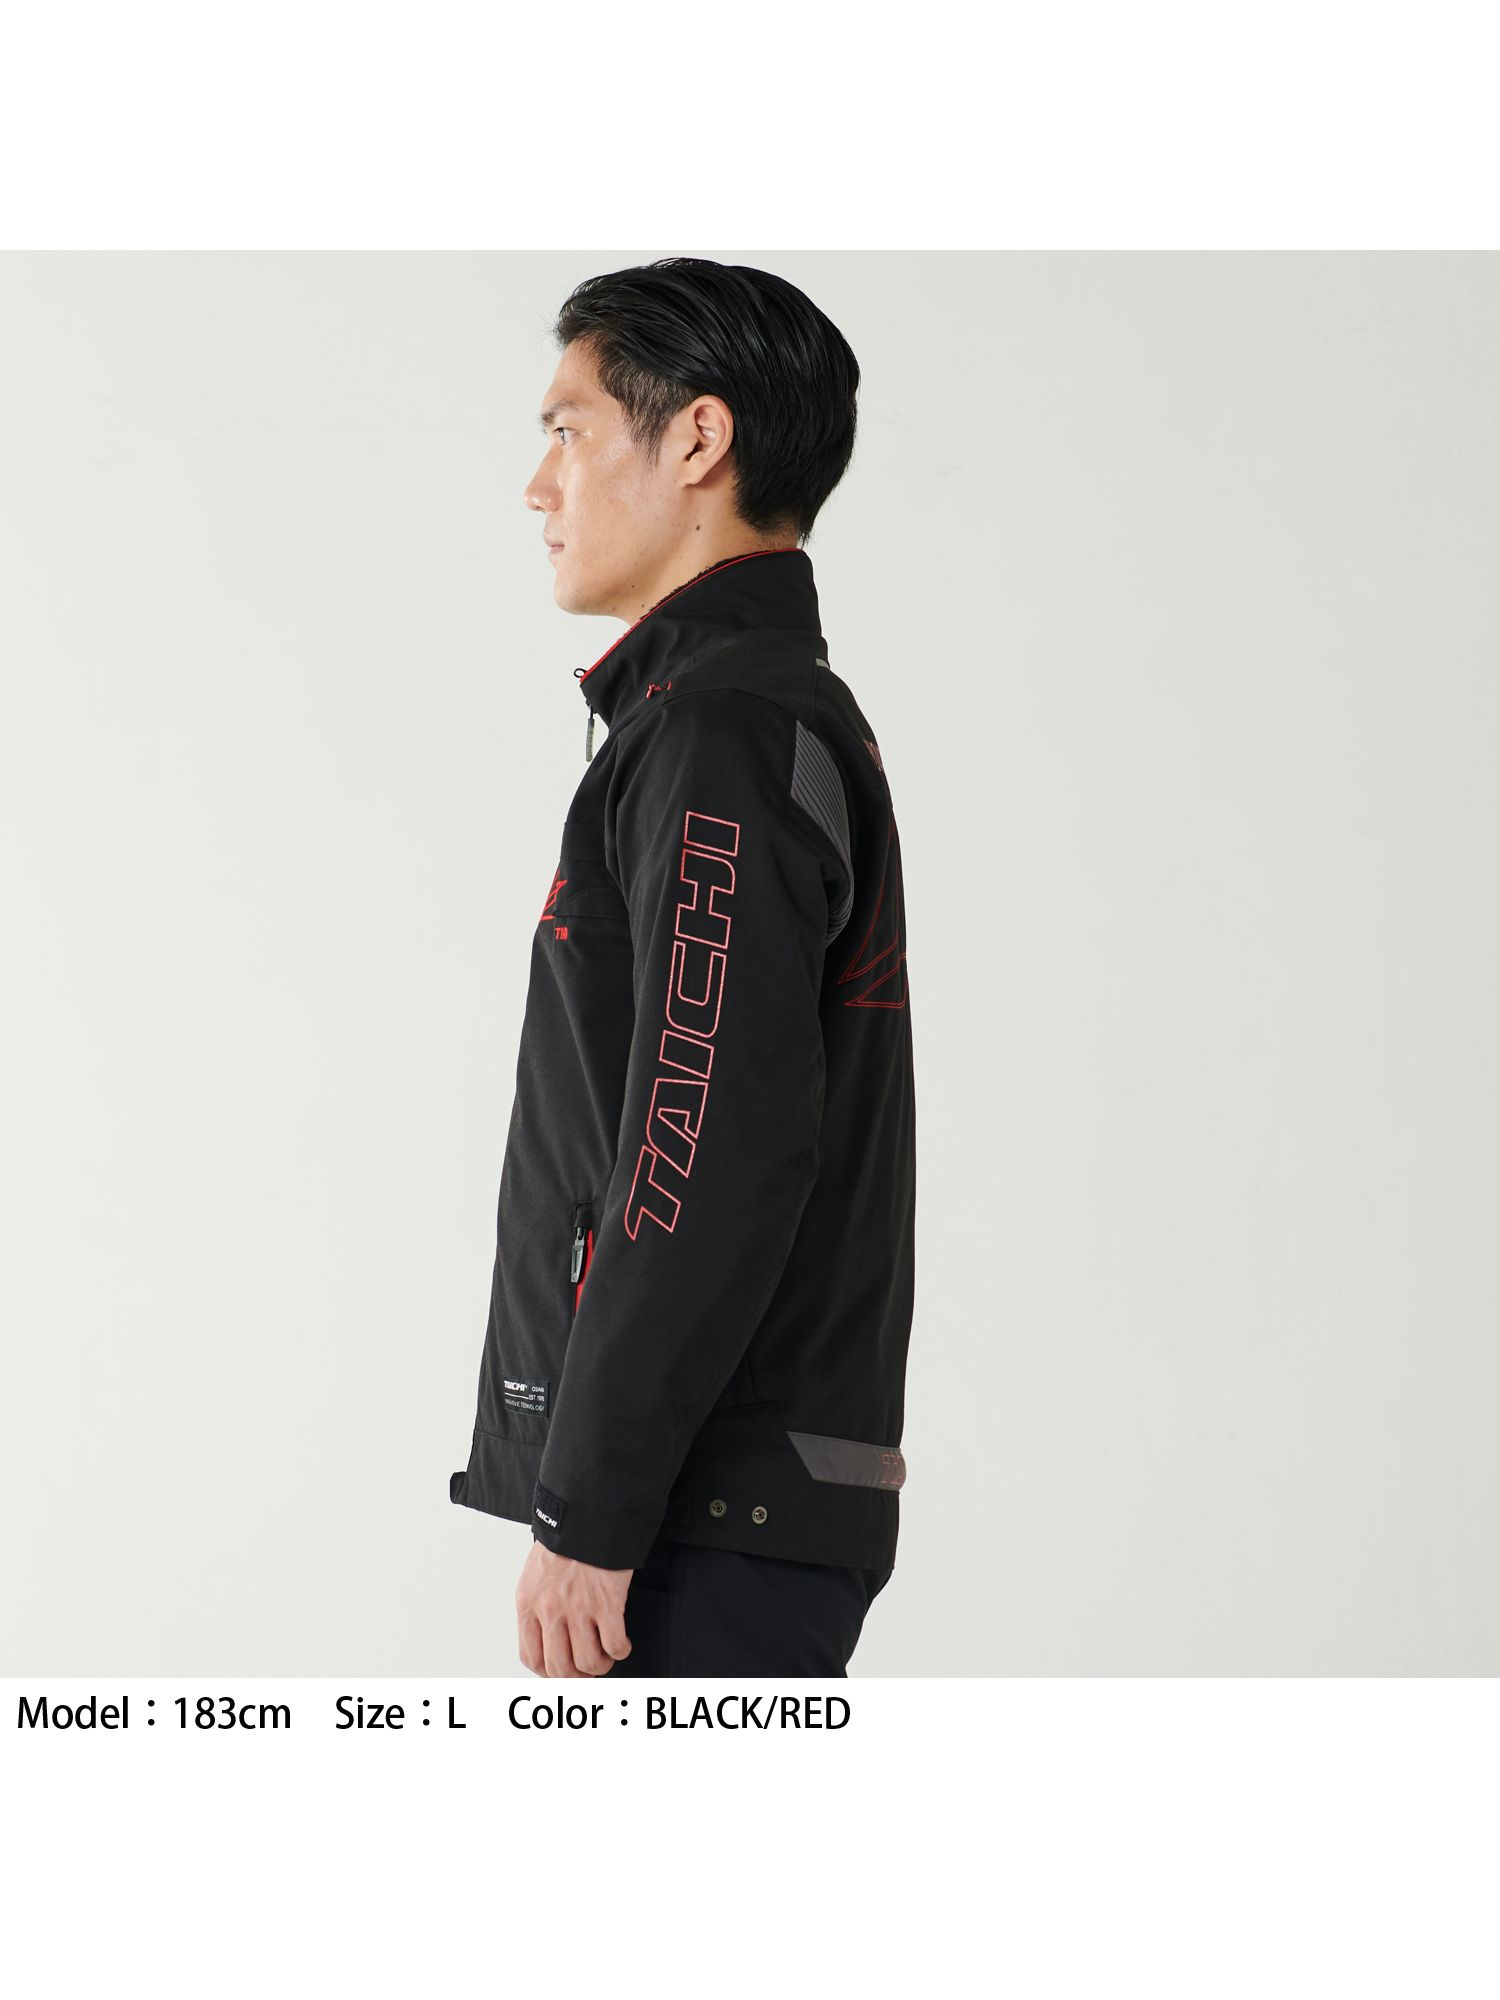 RSJ725 レーサー オールシーズンジャケット[4colors]